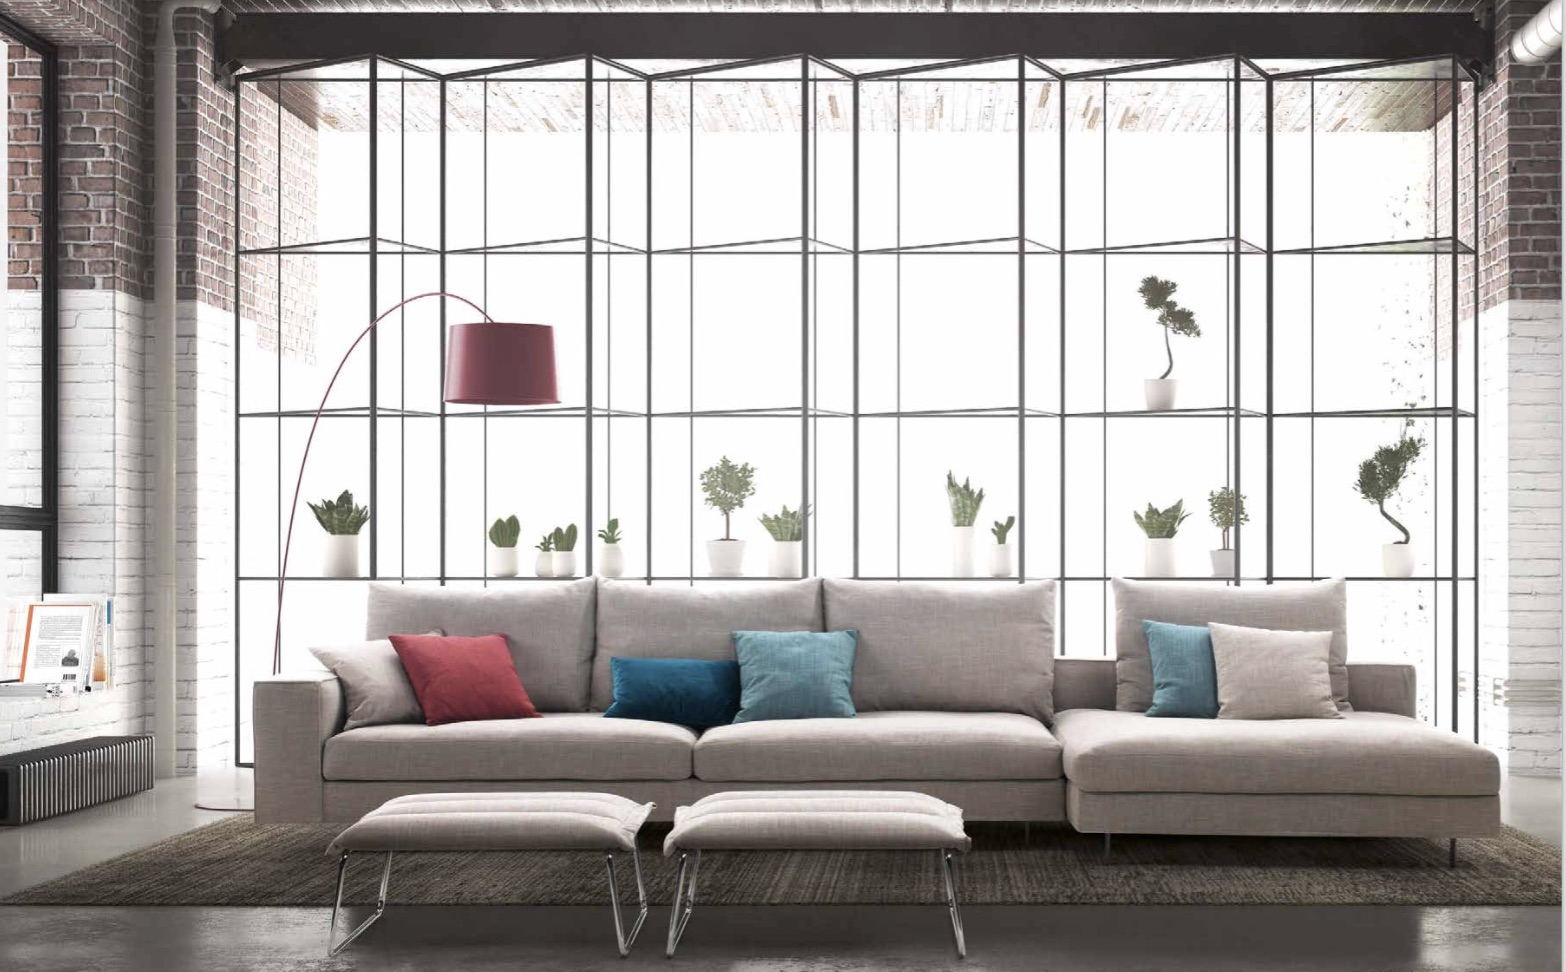 Modern Furniture Fair 2017 momentoitalia italian furniture - blog: 2017